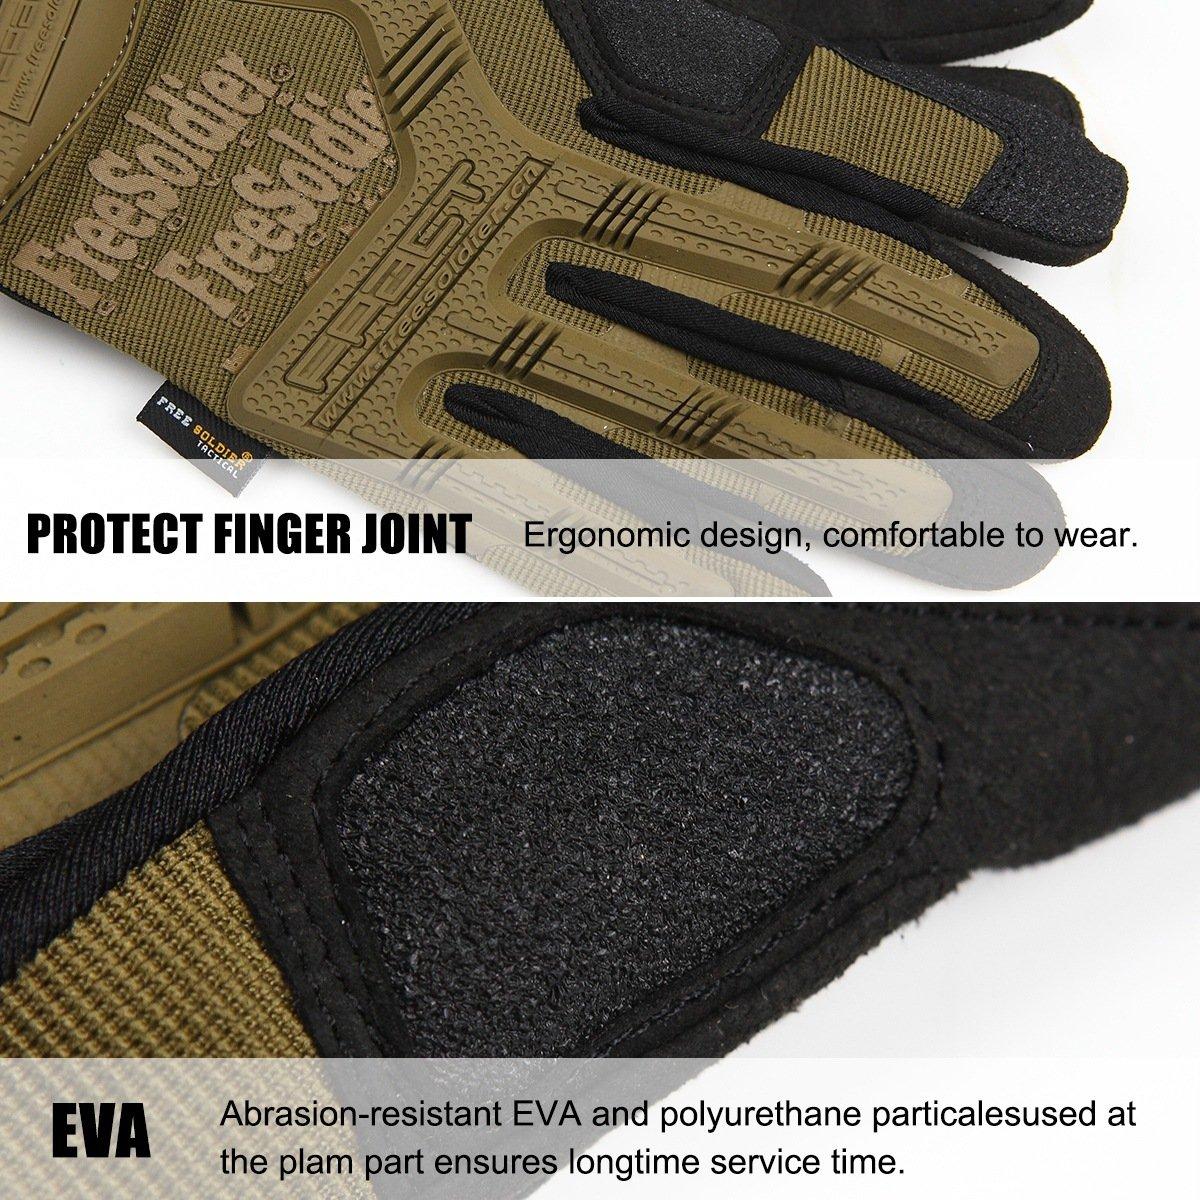 FREE SOLDIER Guantes de Moto para Hombre Verano Guantes T/ácticos Militares Ideal para Motocross Ciclismo Airsoft Combate Alpinismo Guantes